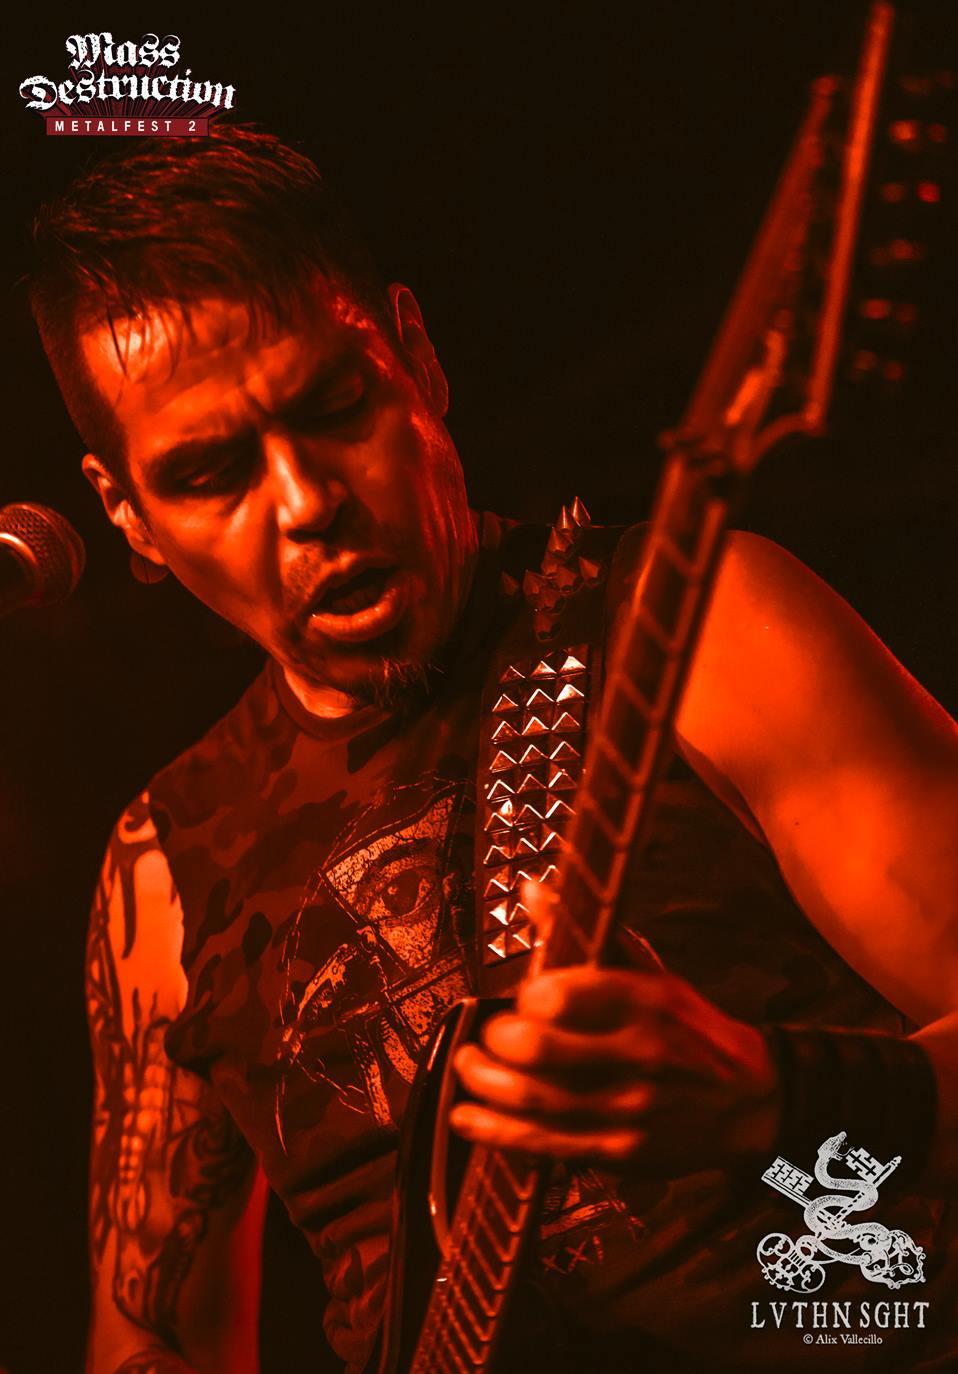 Daniel Corchado